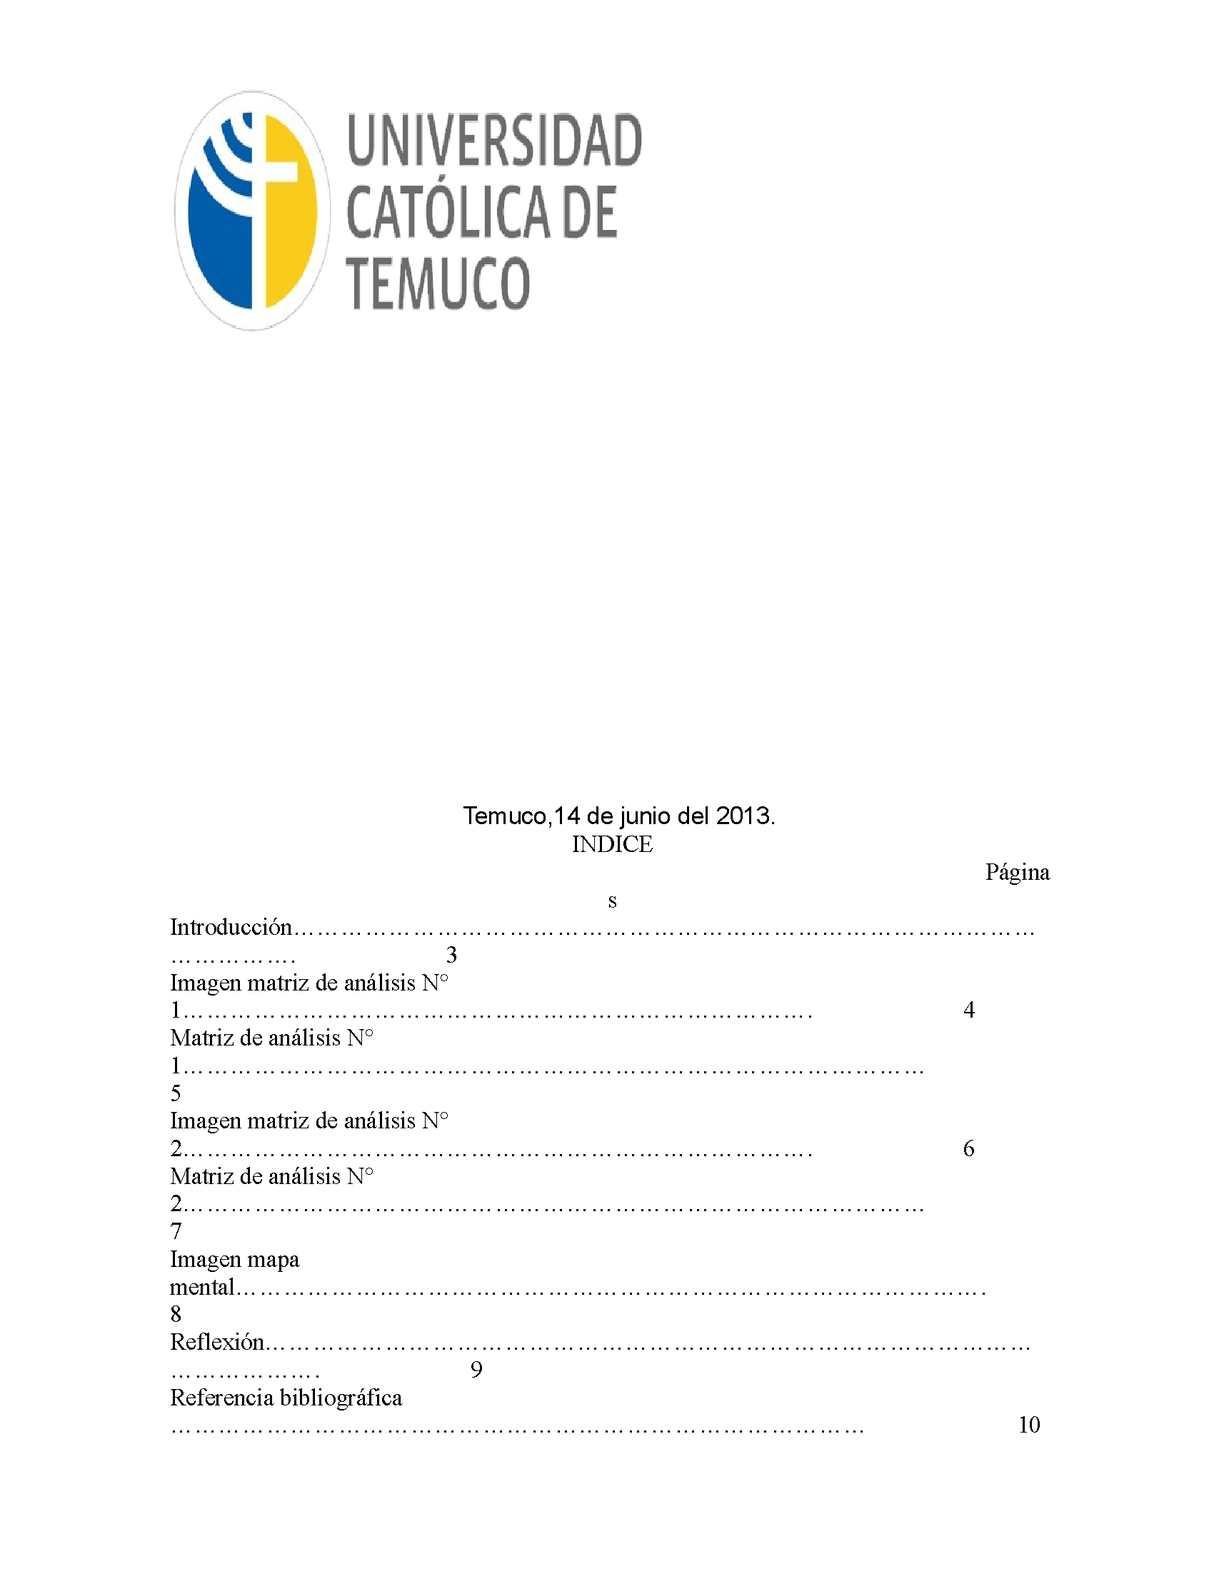 Calaméo - portafolio digital: anatomia humana-katherina alvarez